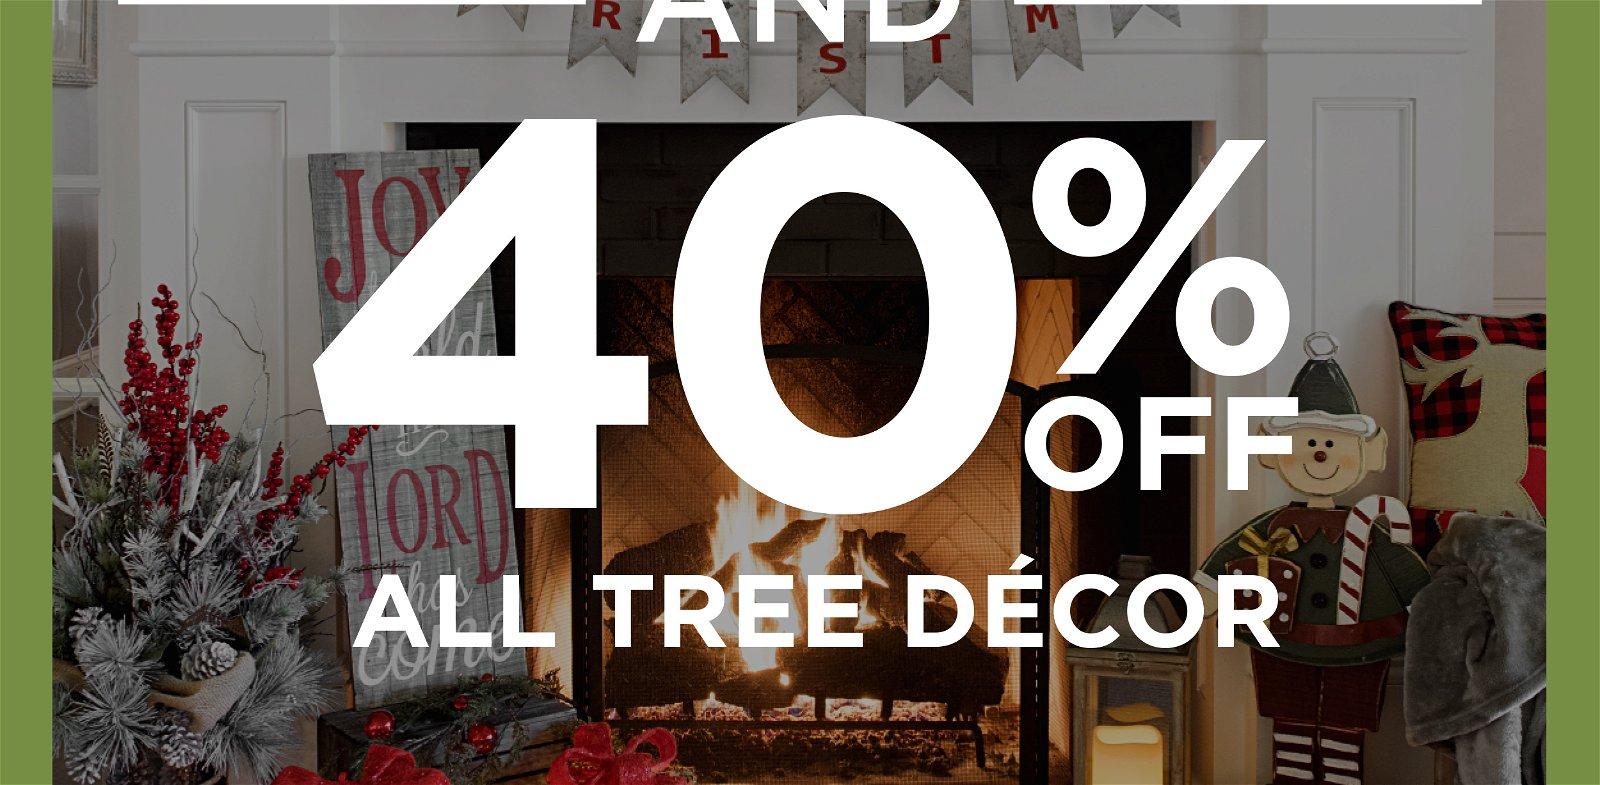 Tree Dcor